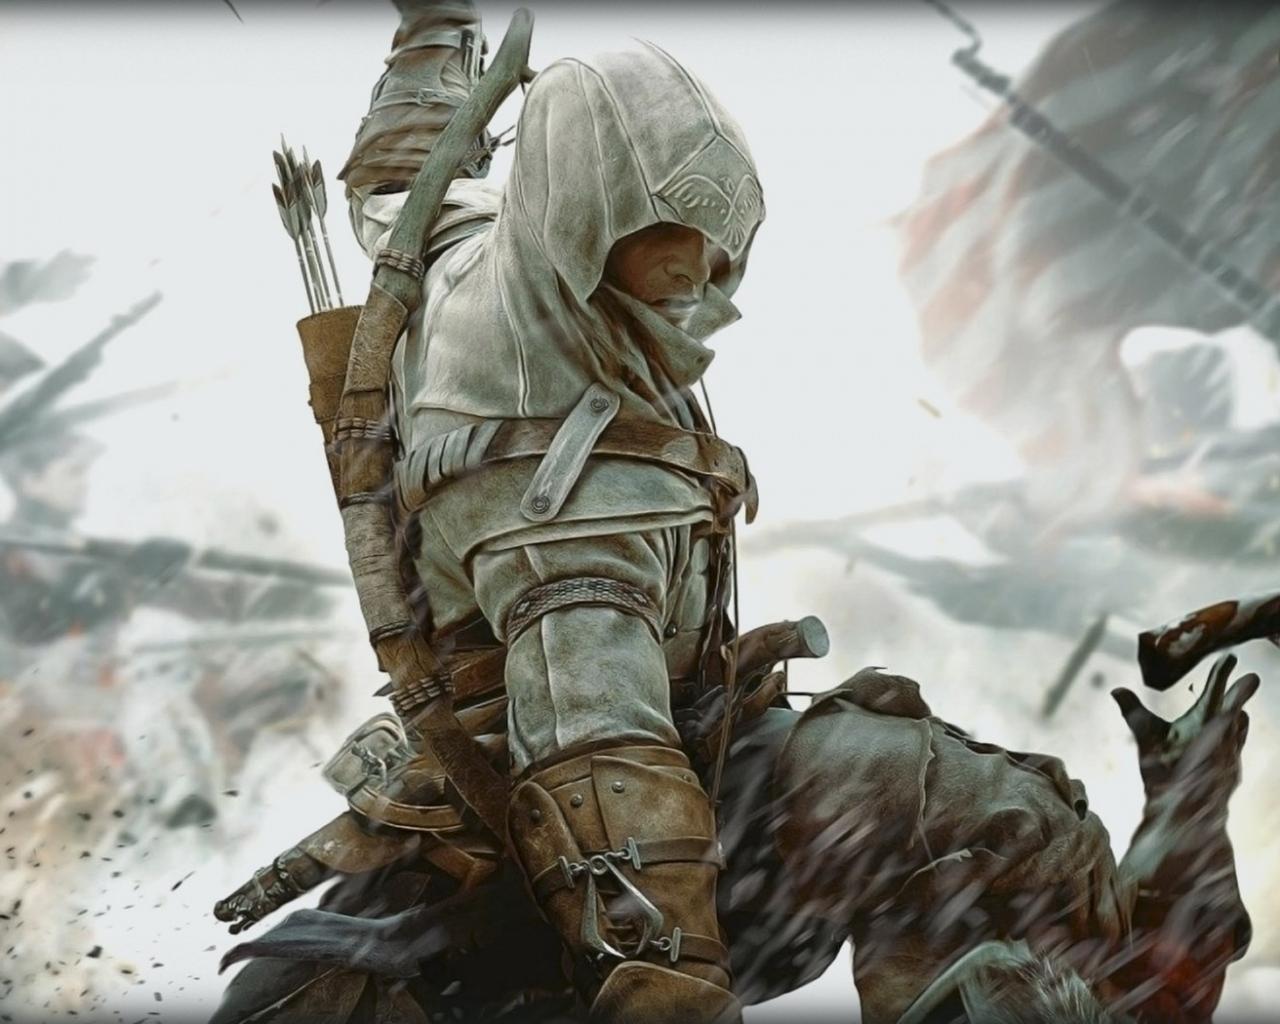 Download Wallpaper 1280x1024 assassins creed 3 desmond miles fight 1280x1024